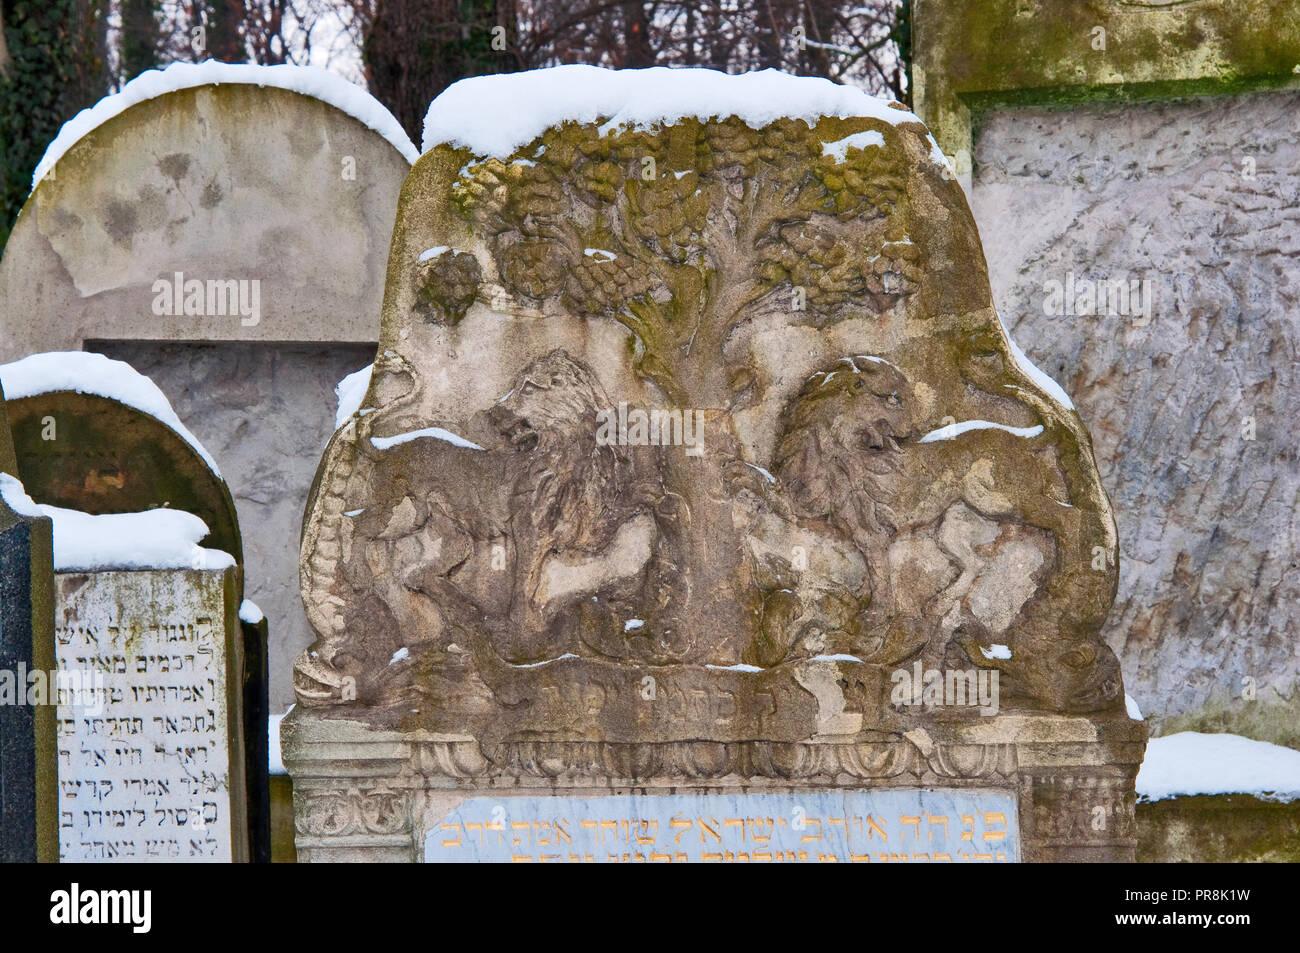 Gravestones at New Jewish Cemetery, Jewish Quarter at Kazimierz district, Krakow, Poland - Stock Image